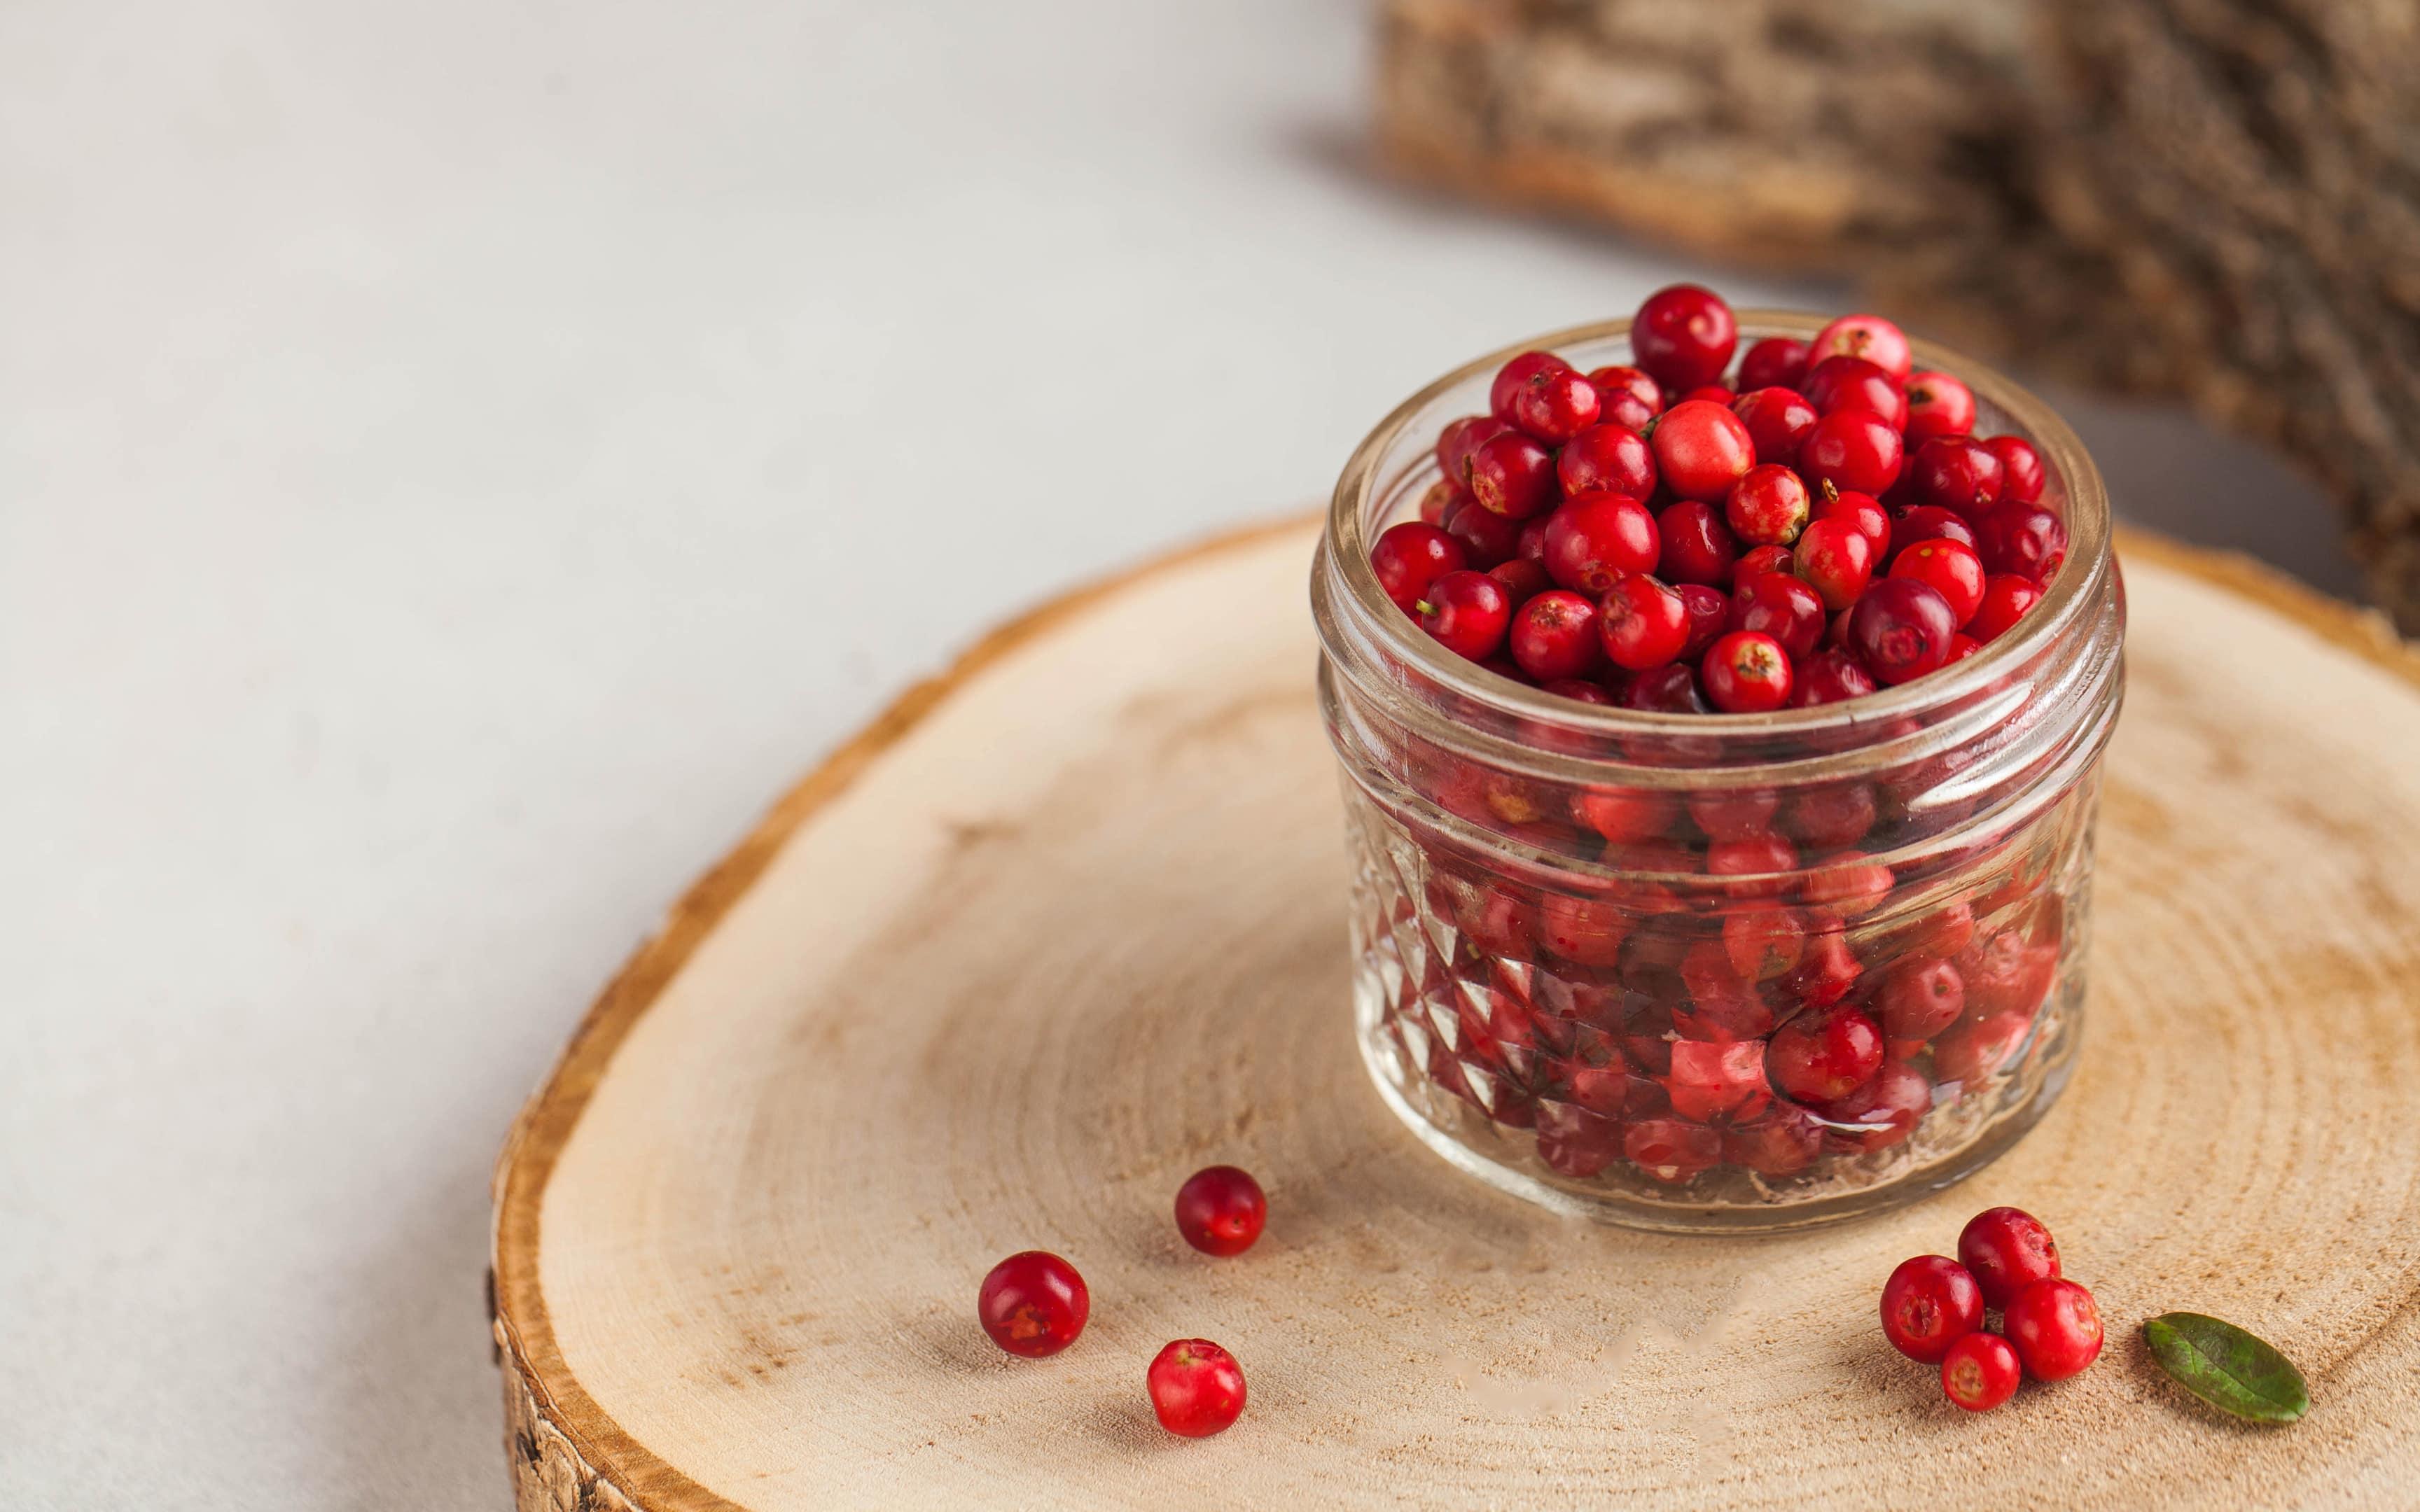 Fresh ripe cranberries in glass jar on wooden board